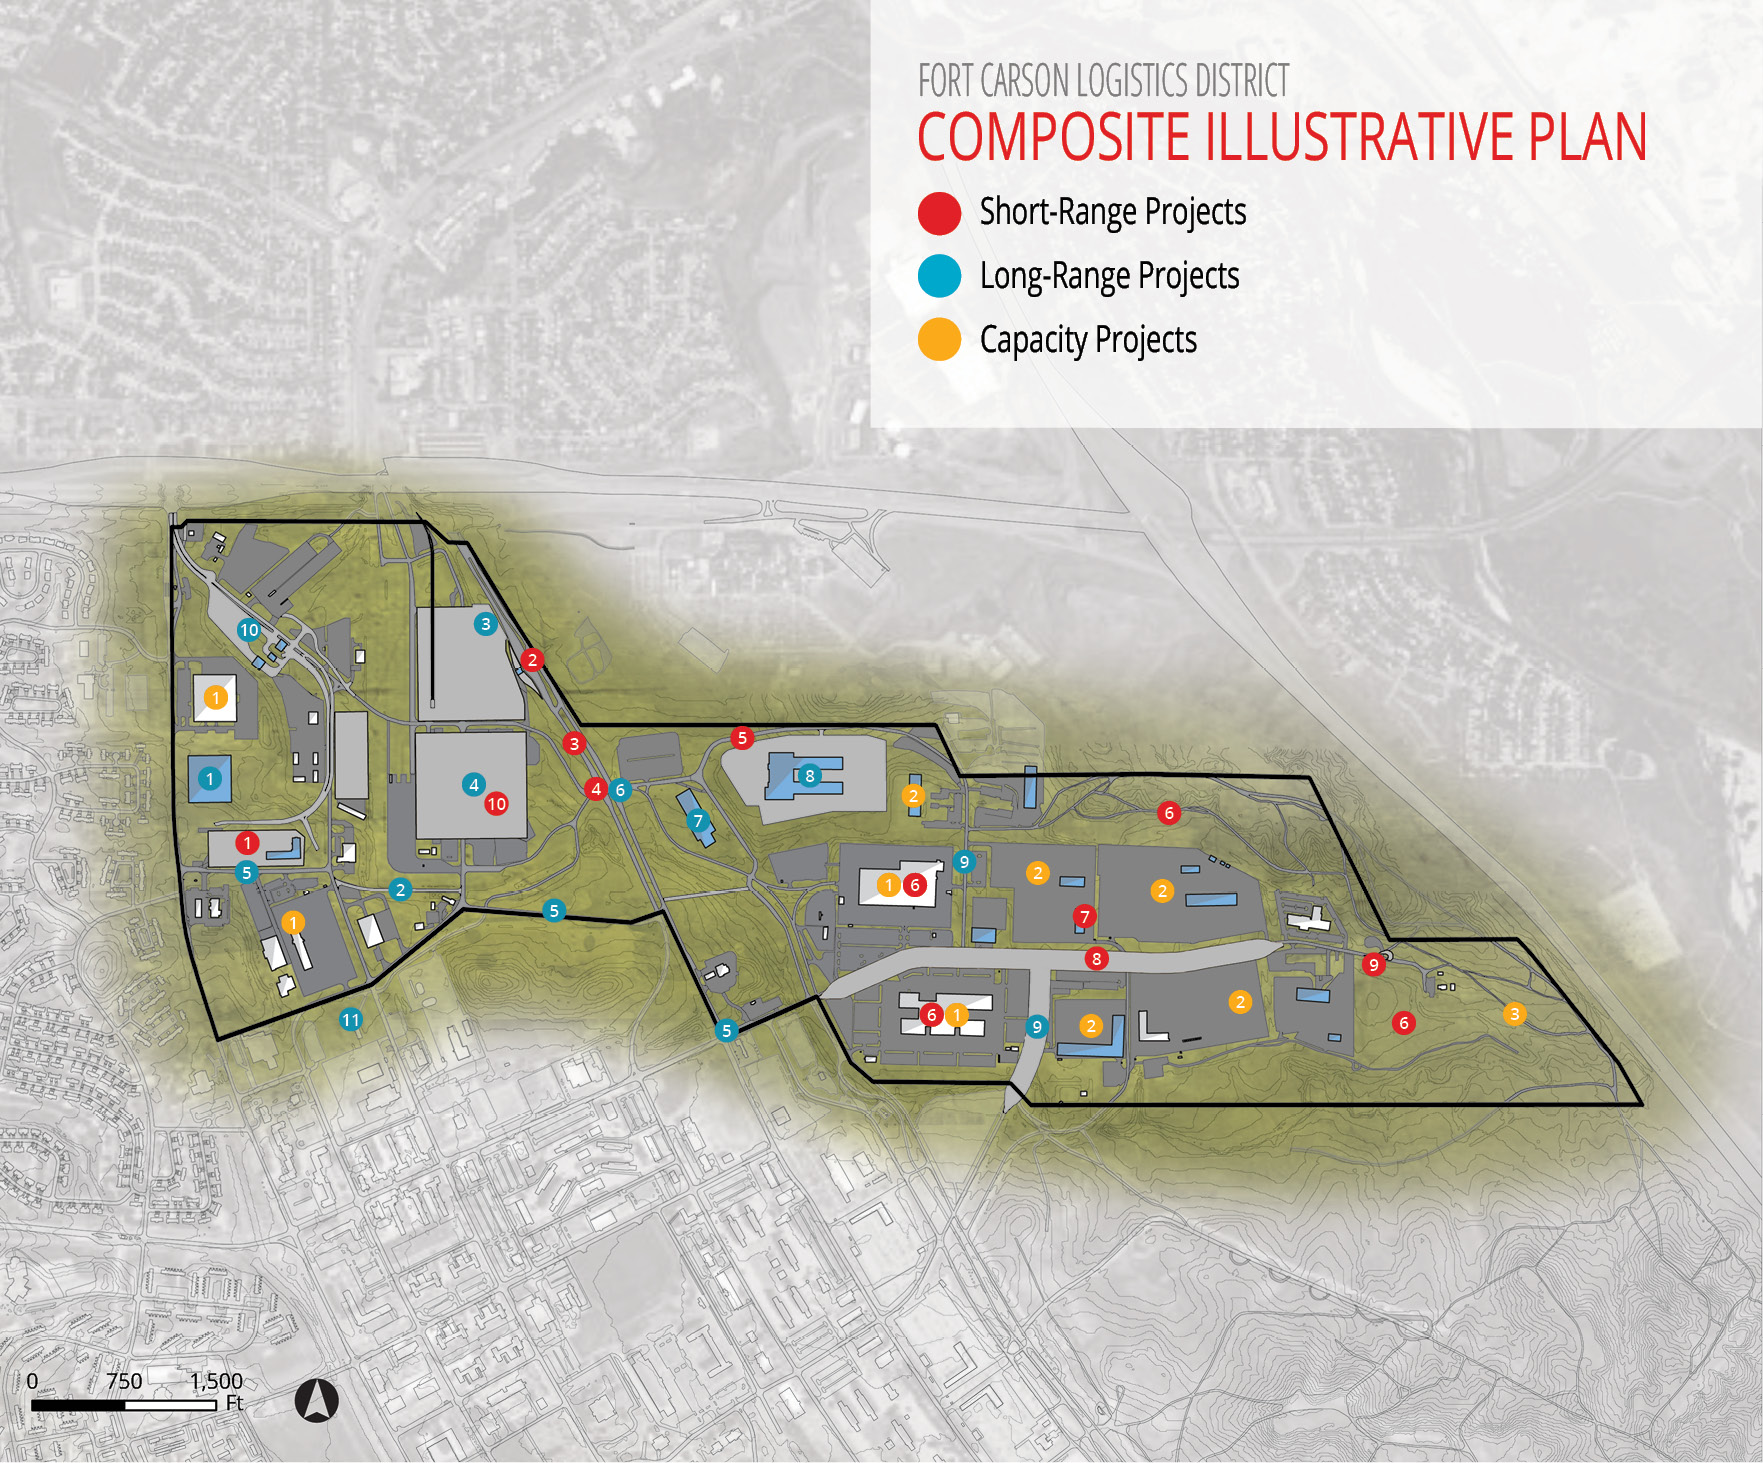 Composite Illustrative Plans3.jpg